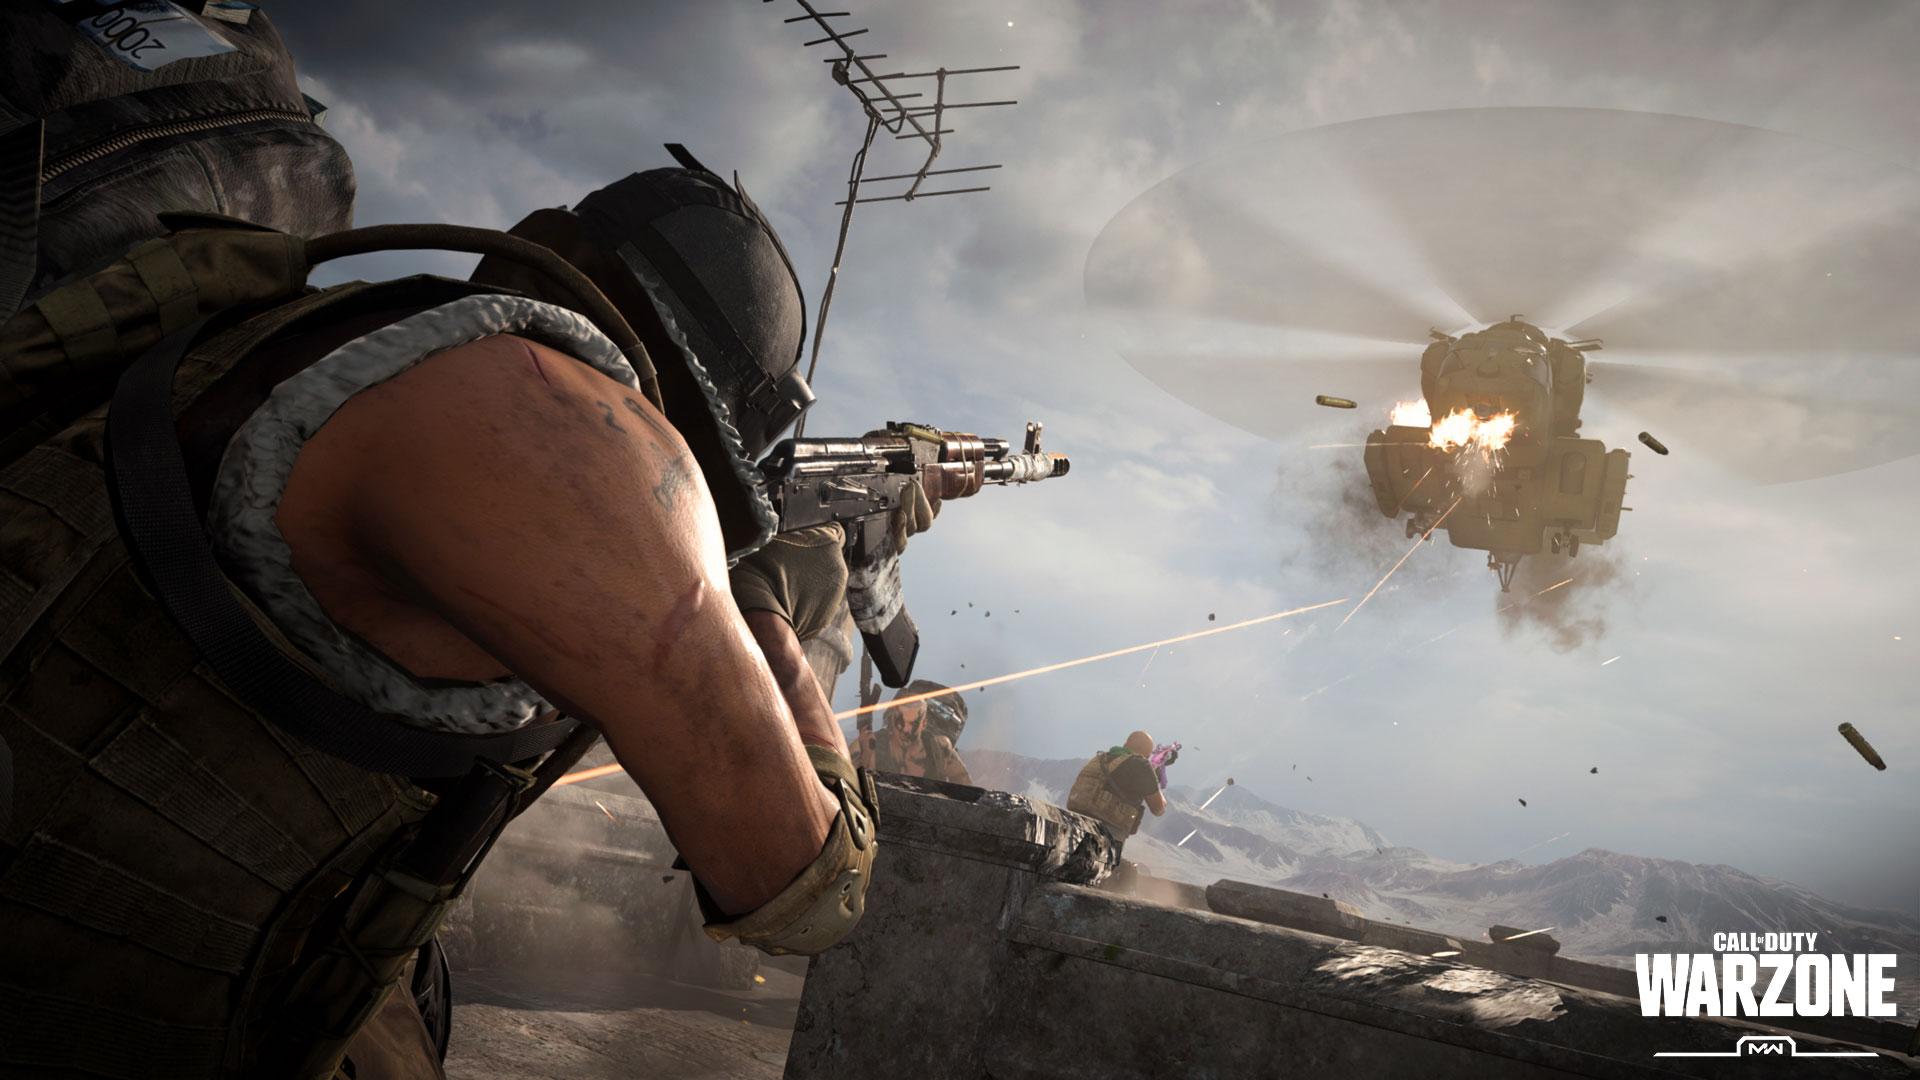 Warzone Mode Recon: Plunder - Image 6